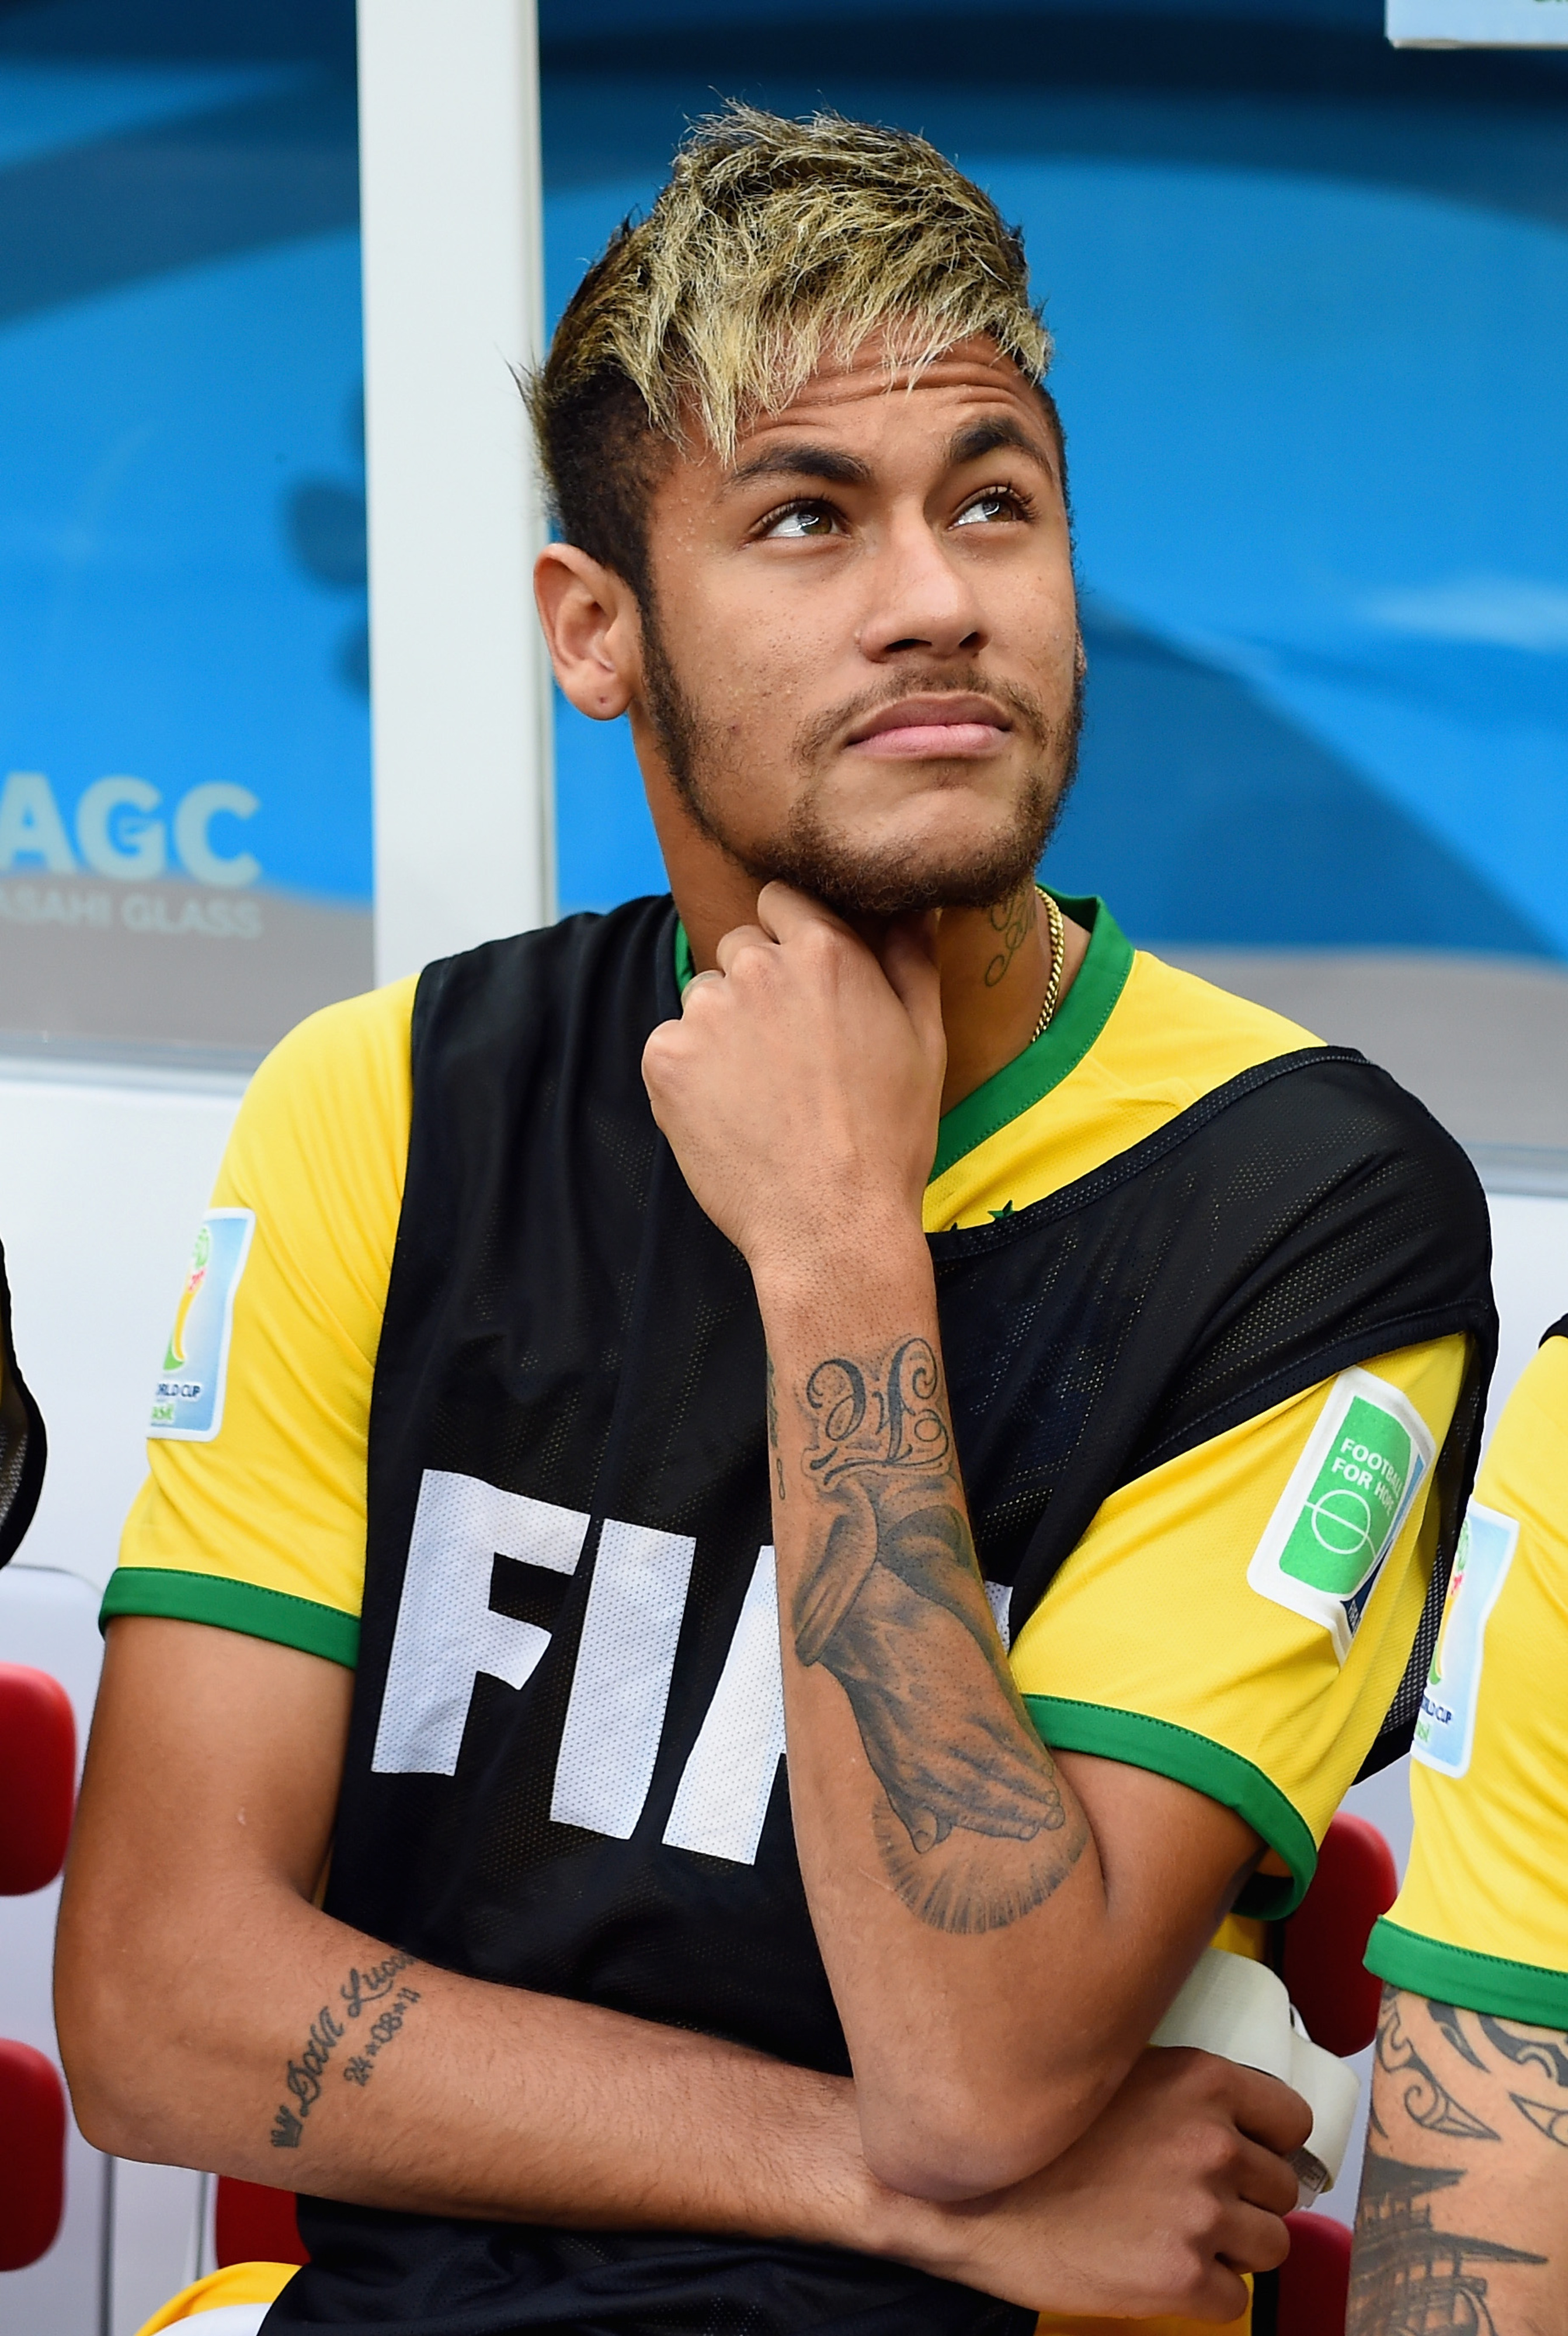 New Brazil coach criticizes Neymar over choice of hats, hair dye